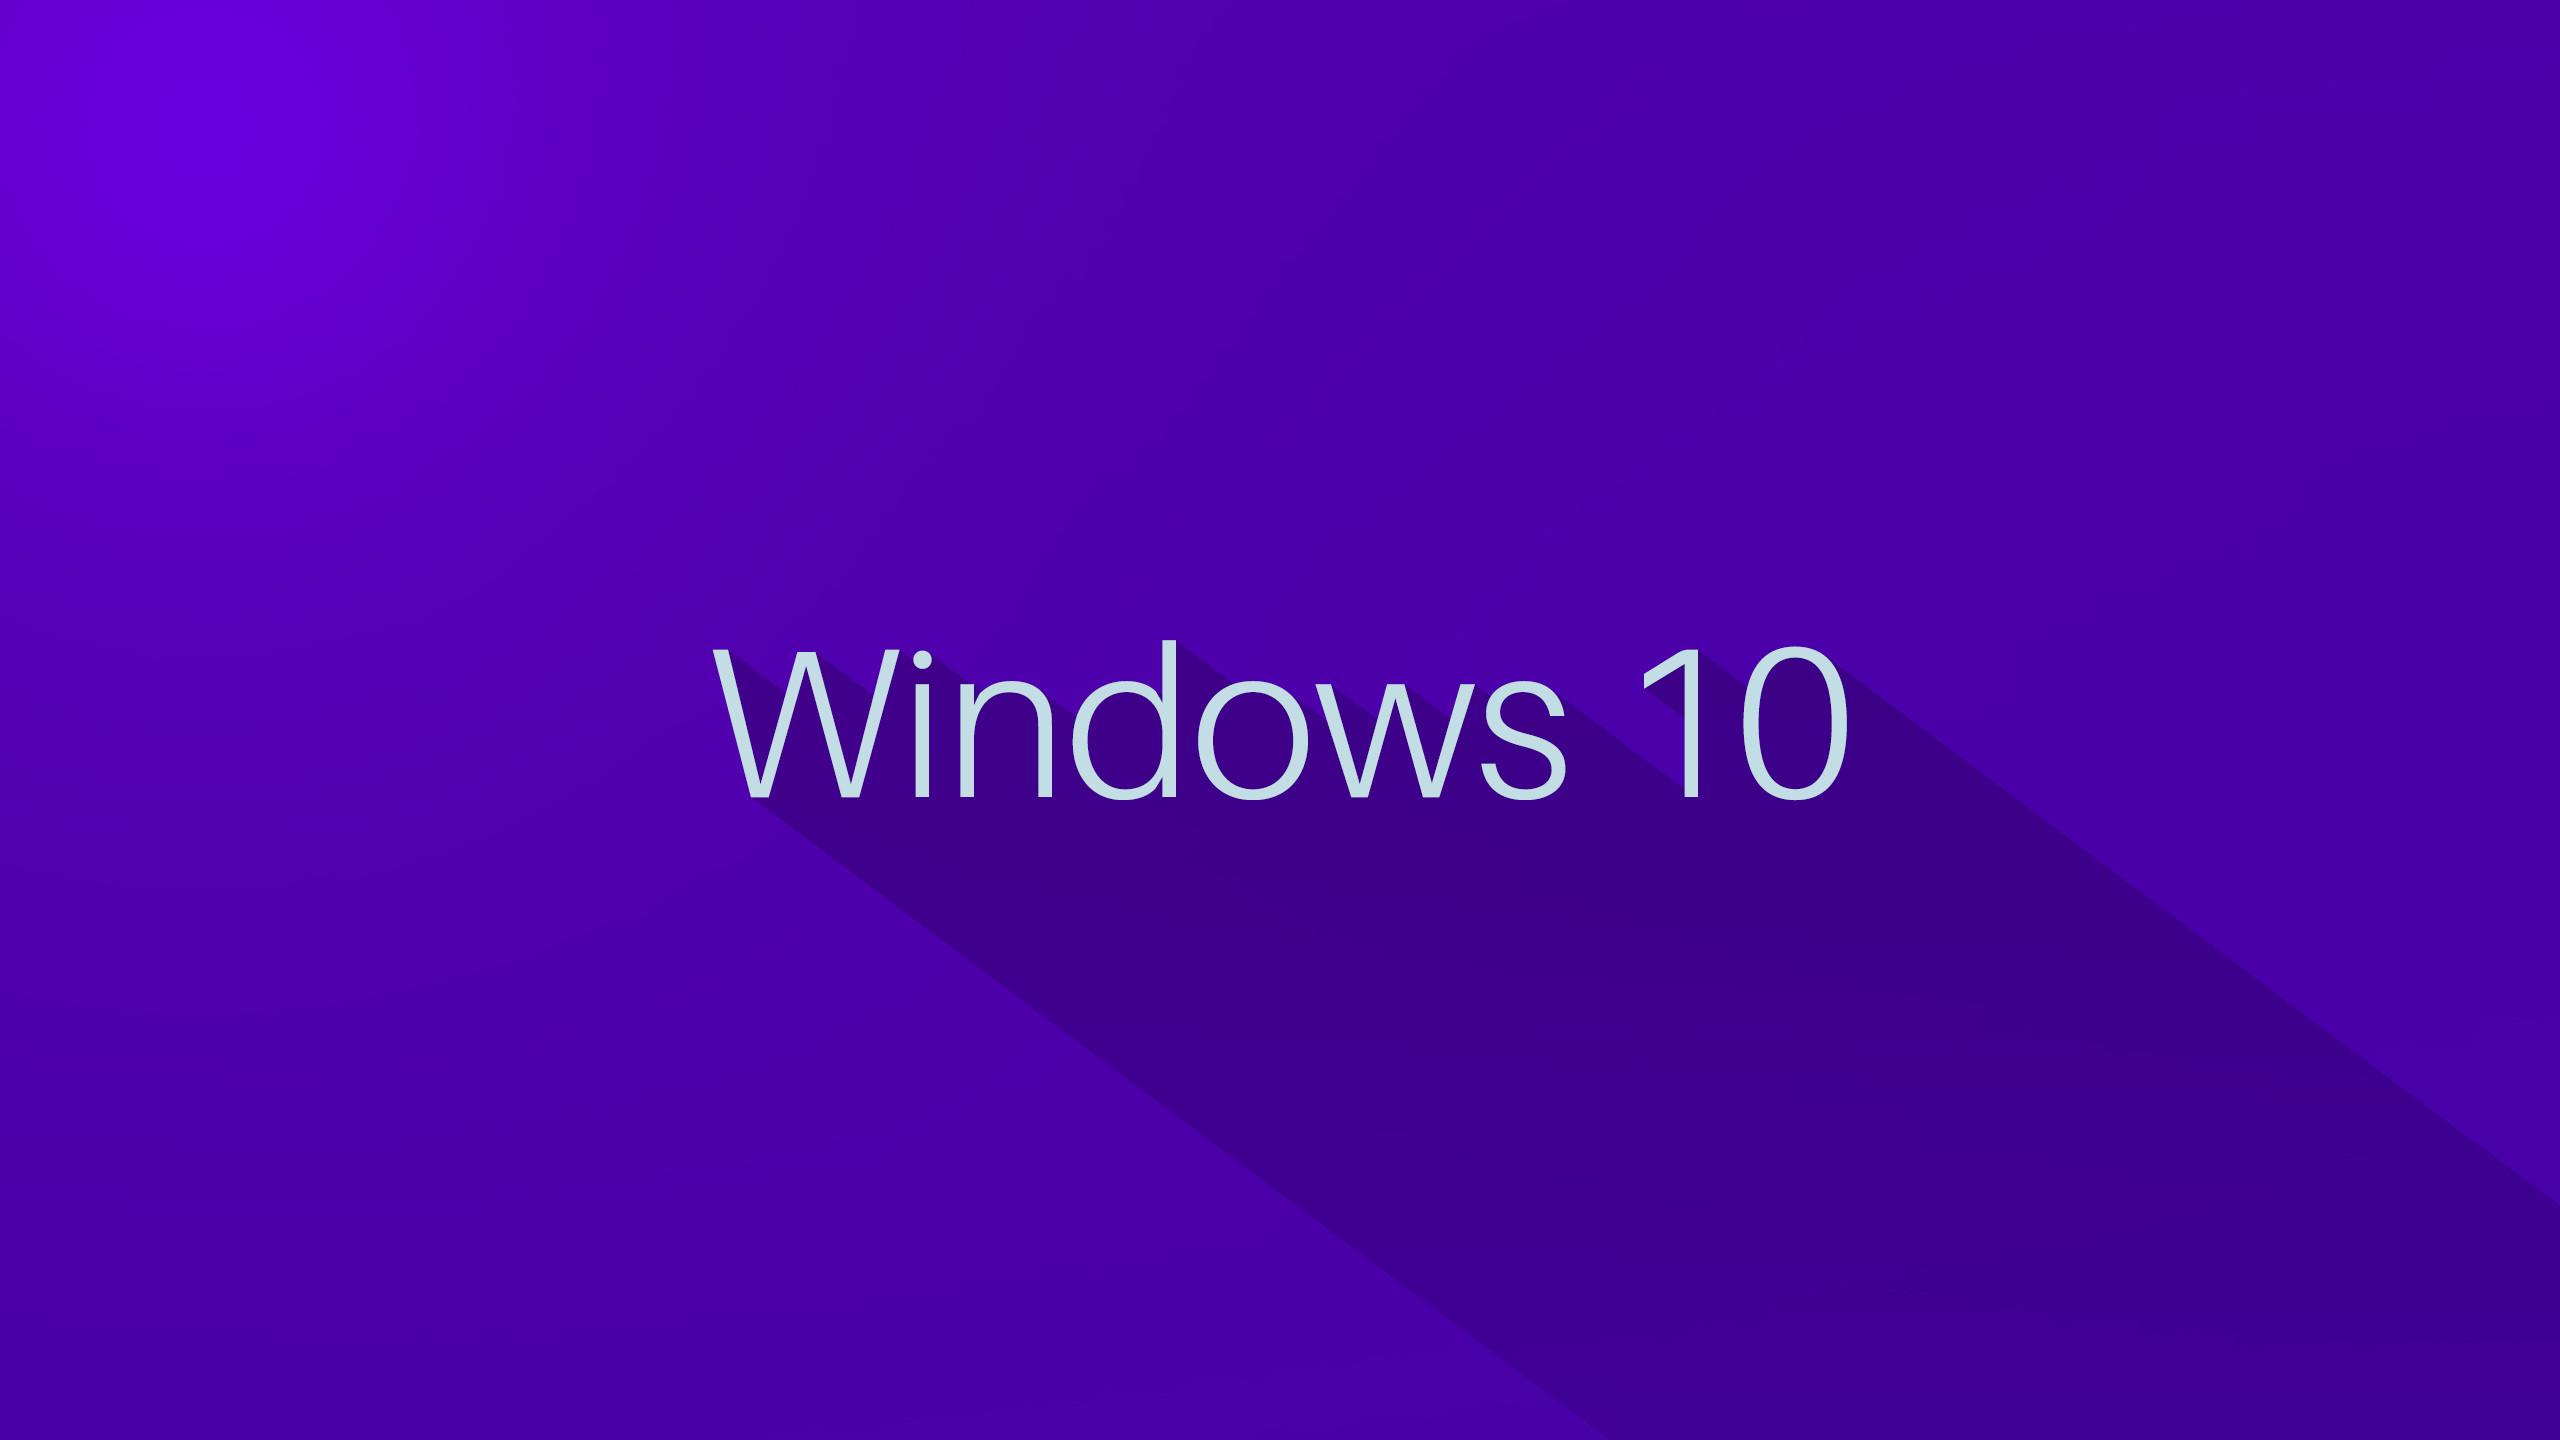 2560x1440 Windows-10-Wallpaper-1080p-Full-HD-Logo-on